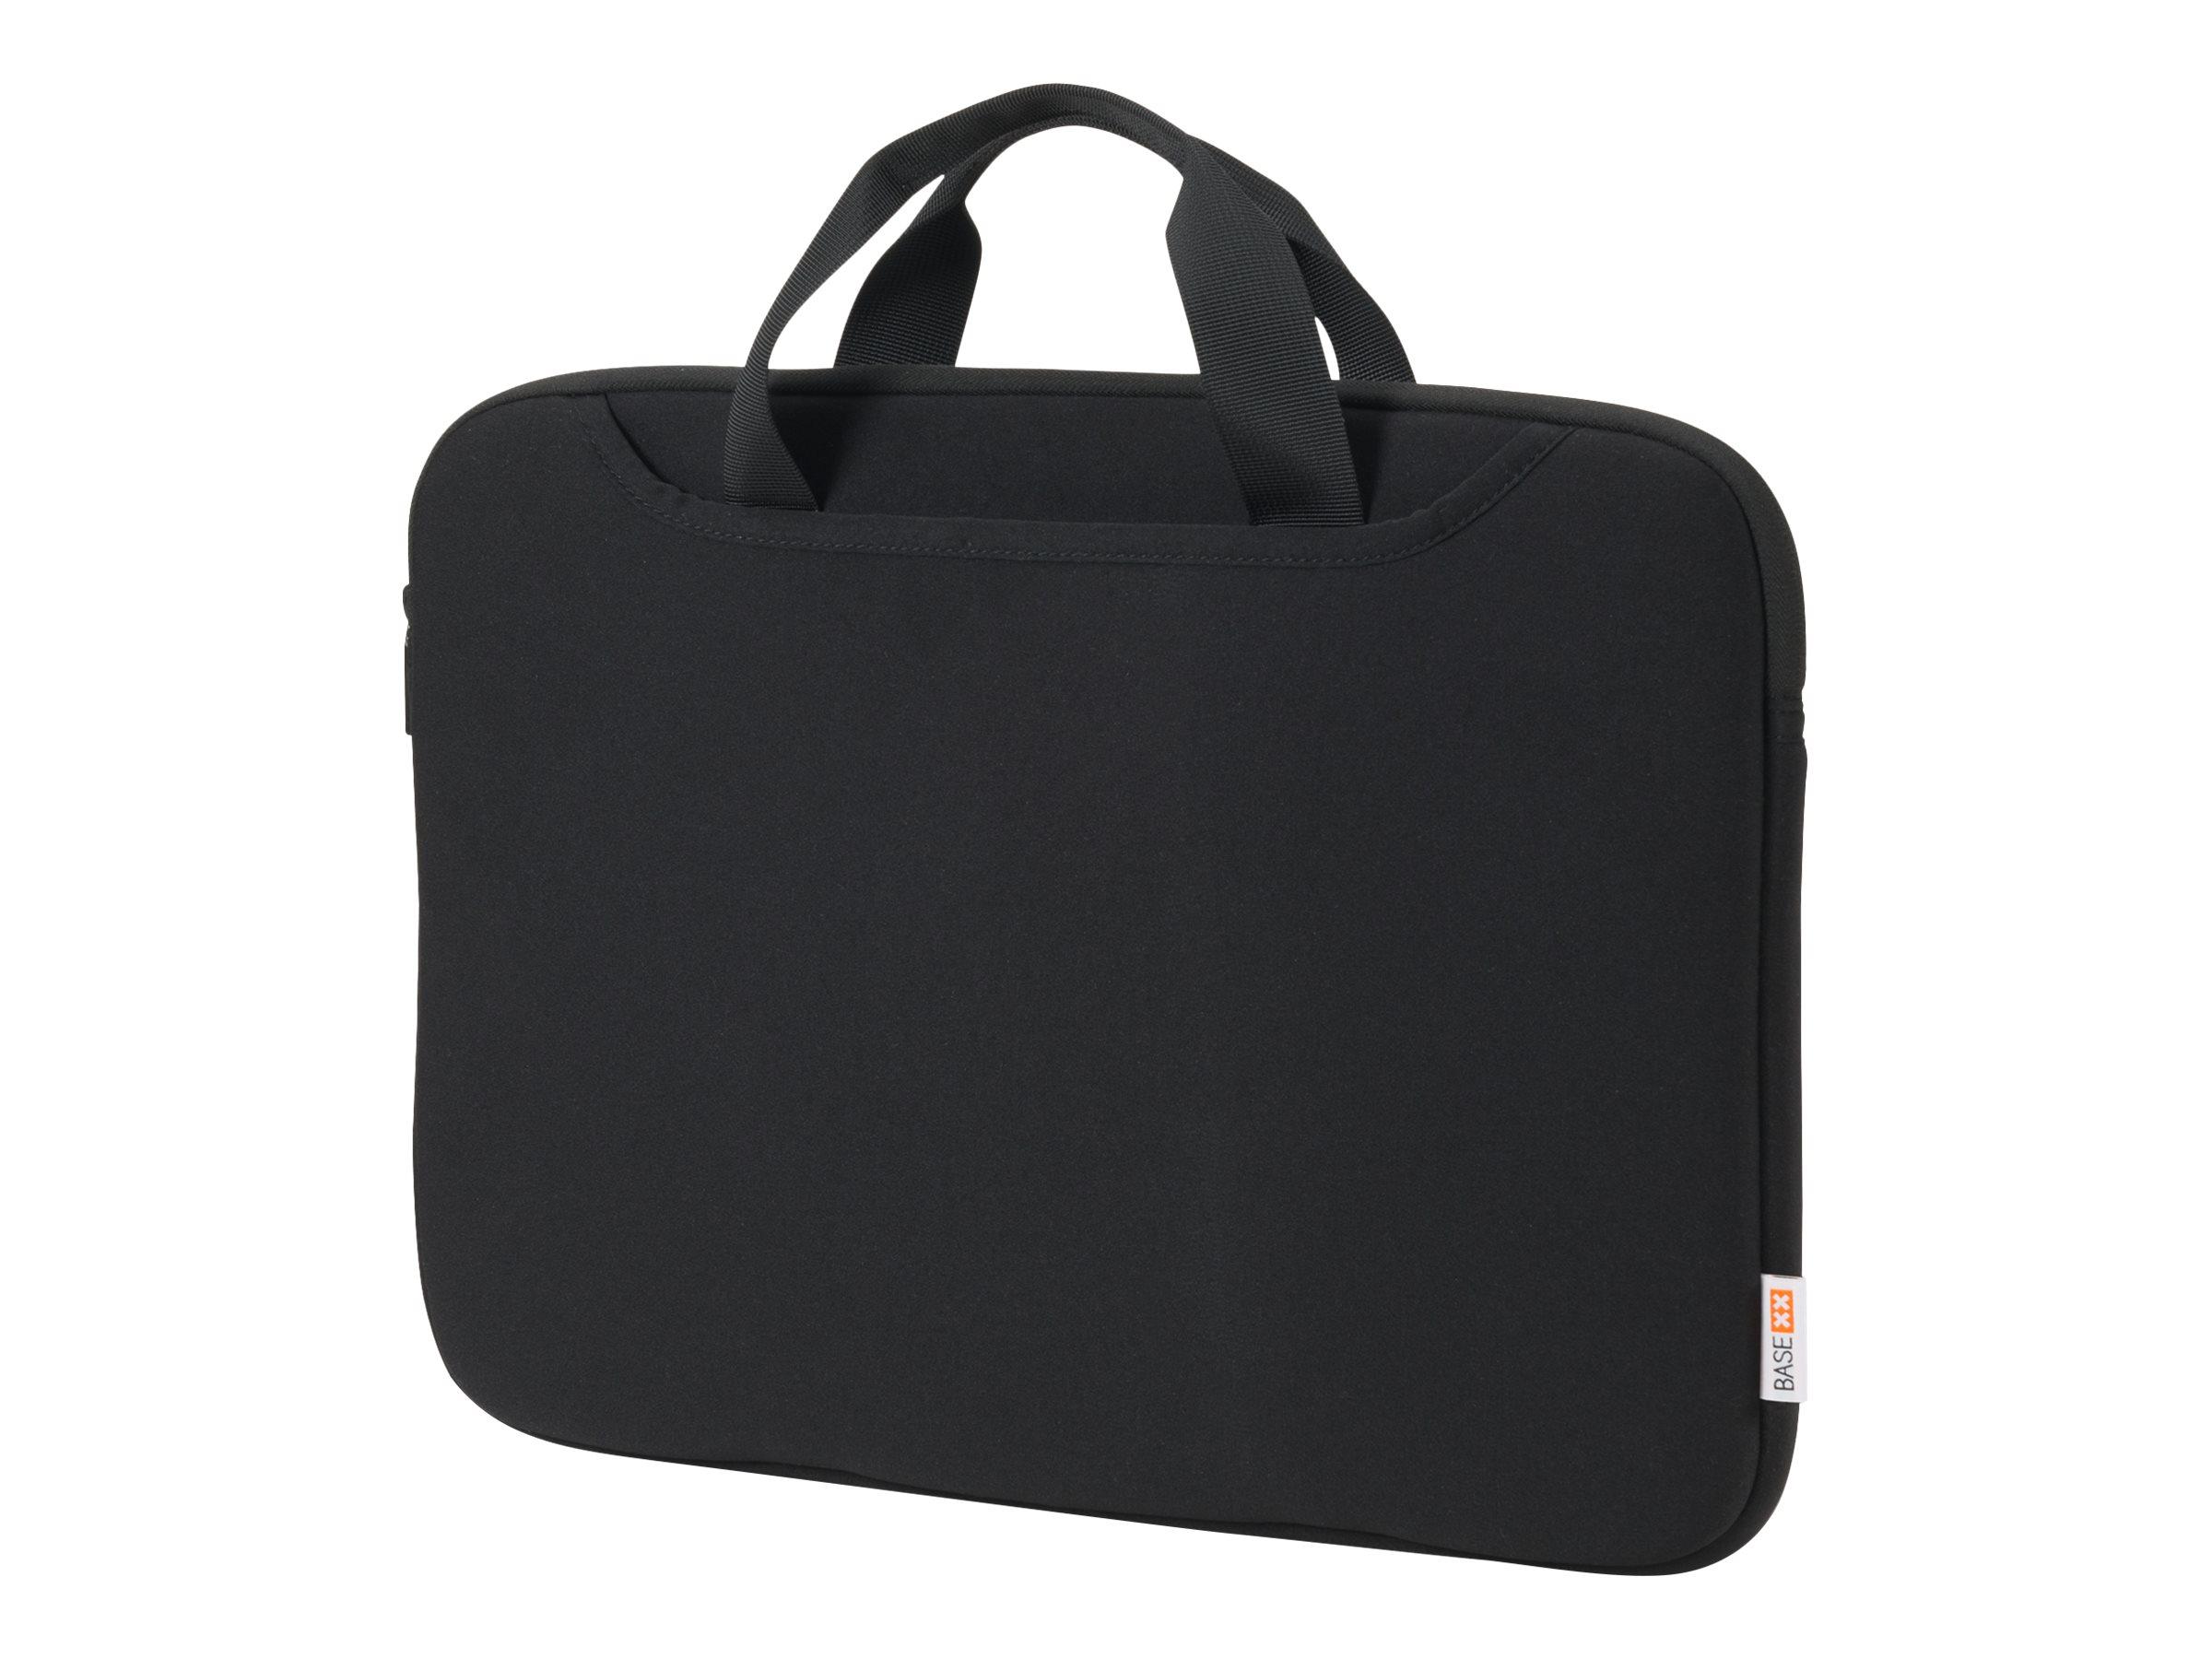 DICOTA BASE XX Plus - Notebook-Tasche - 31.8 cm - 12